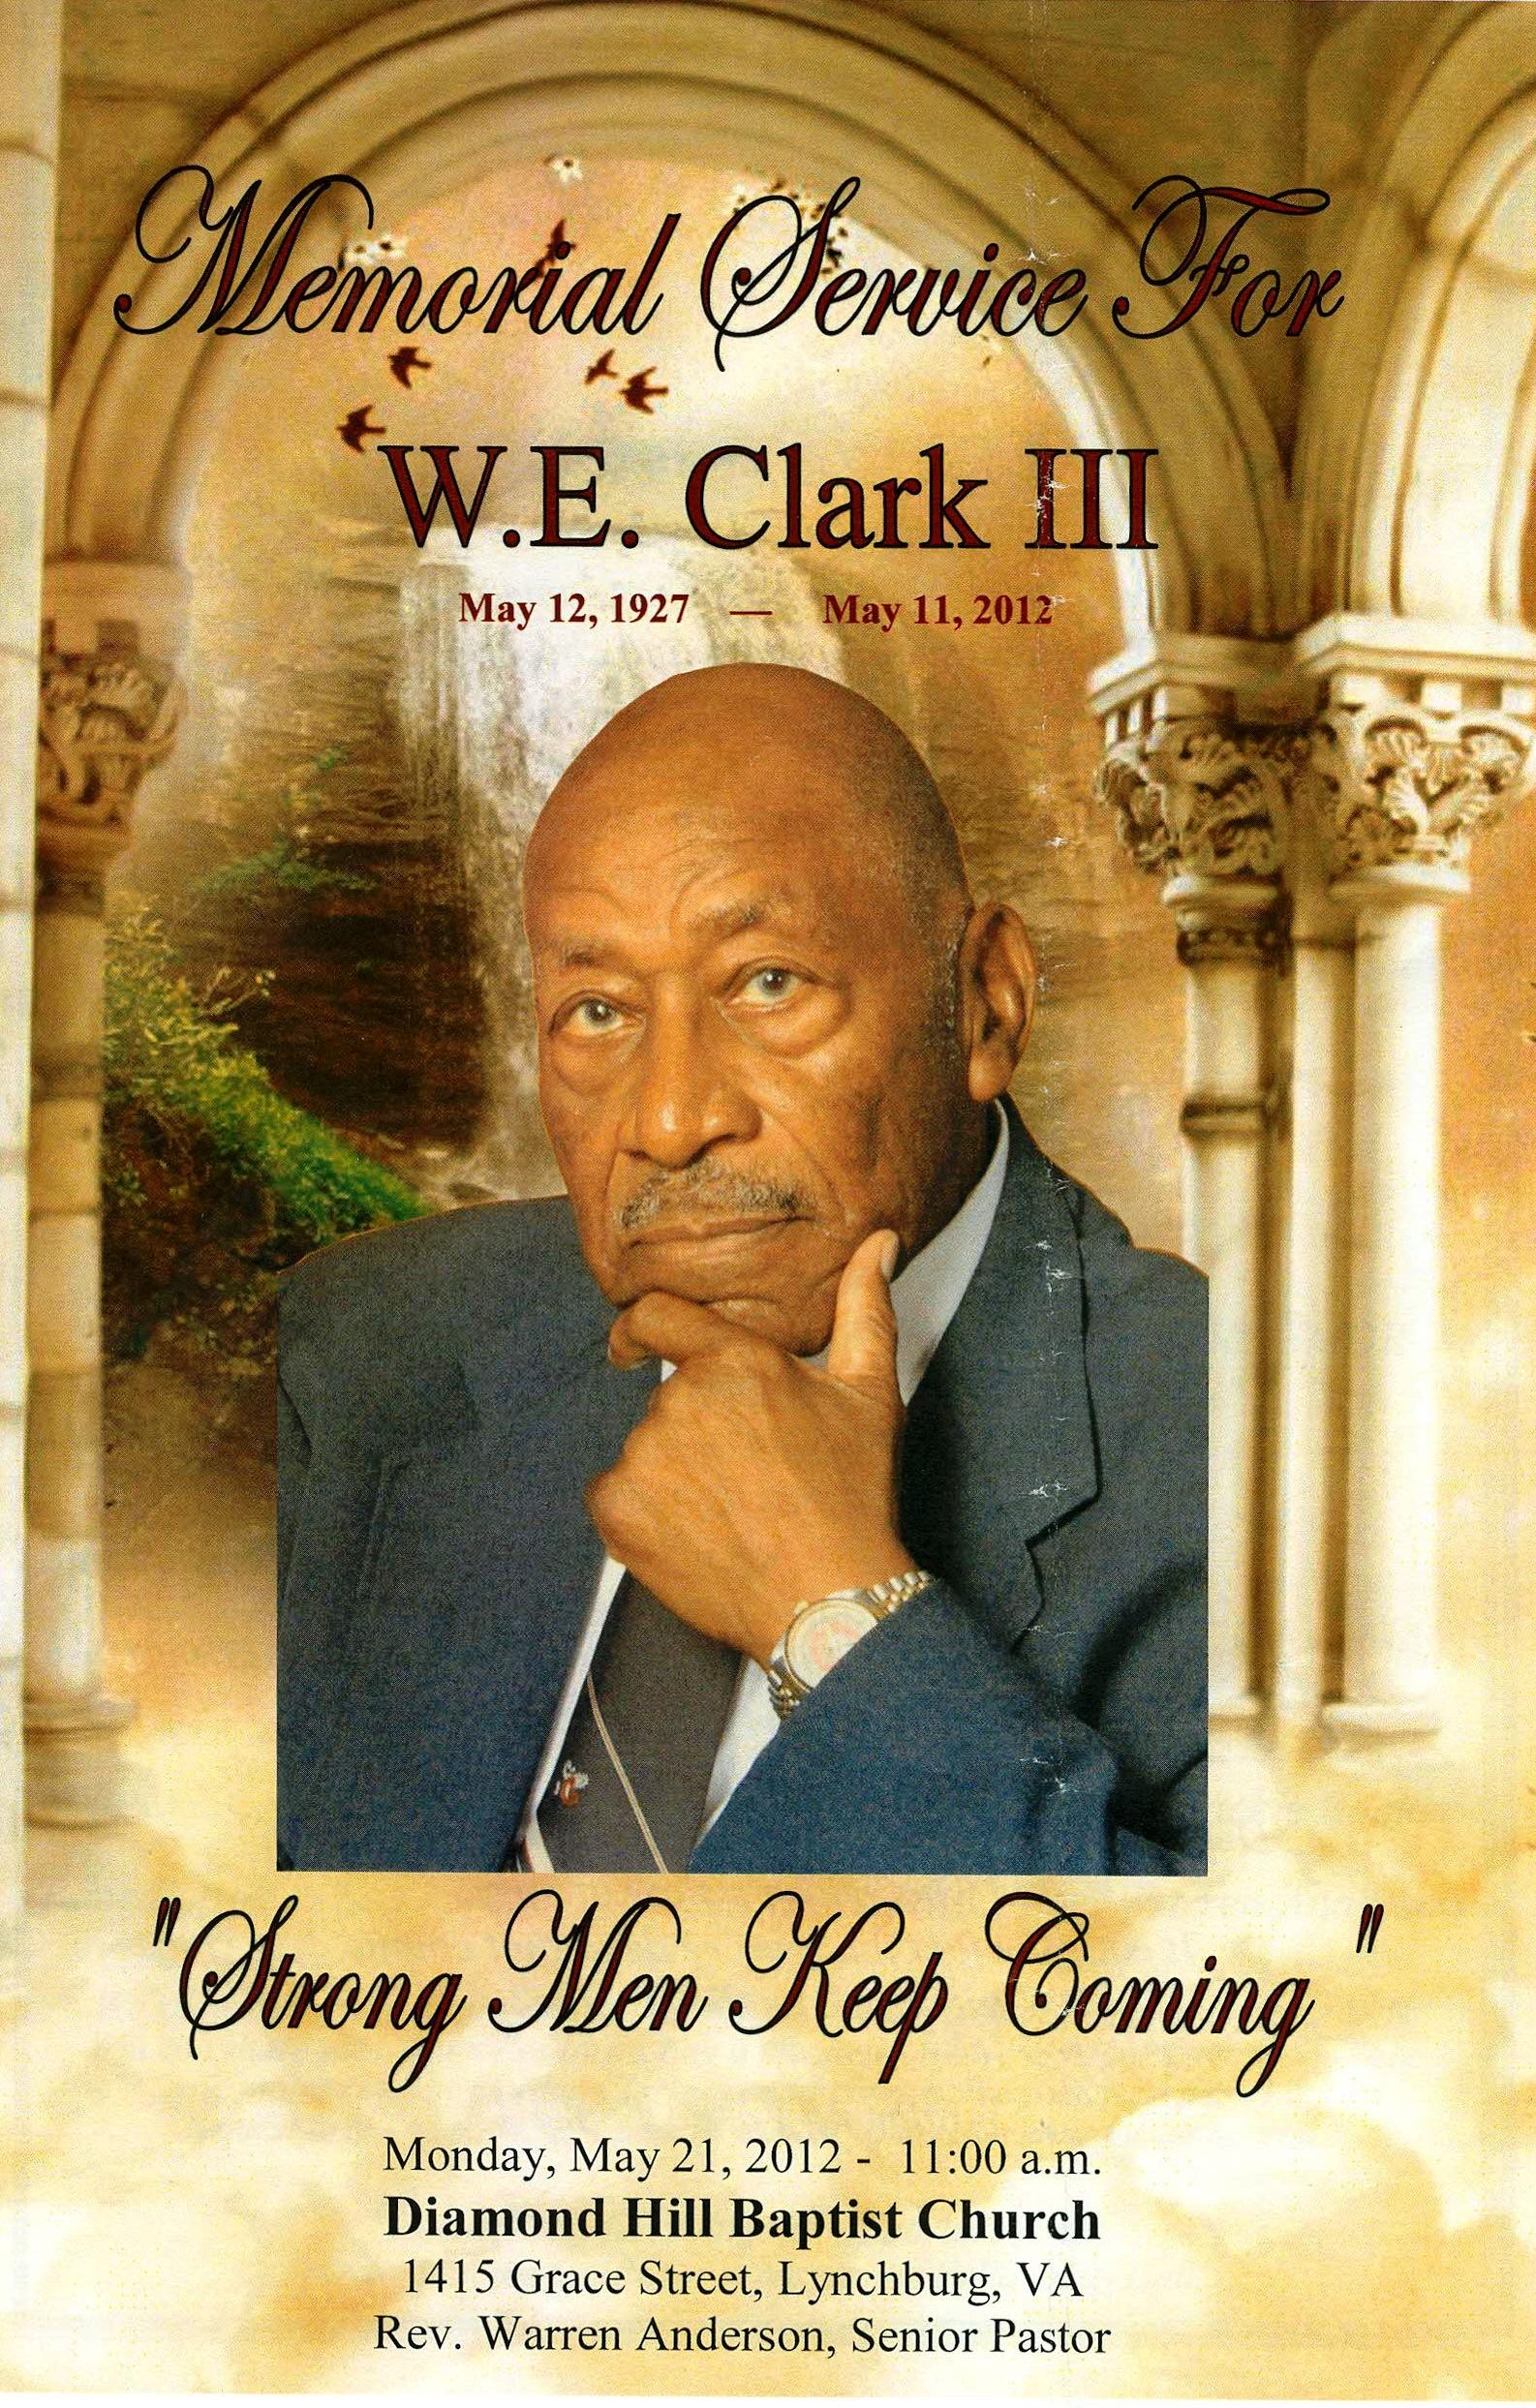 Willie E. Clark III